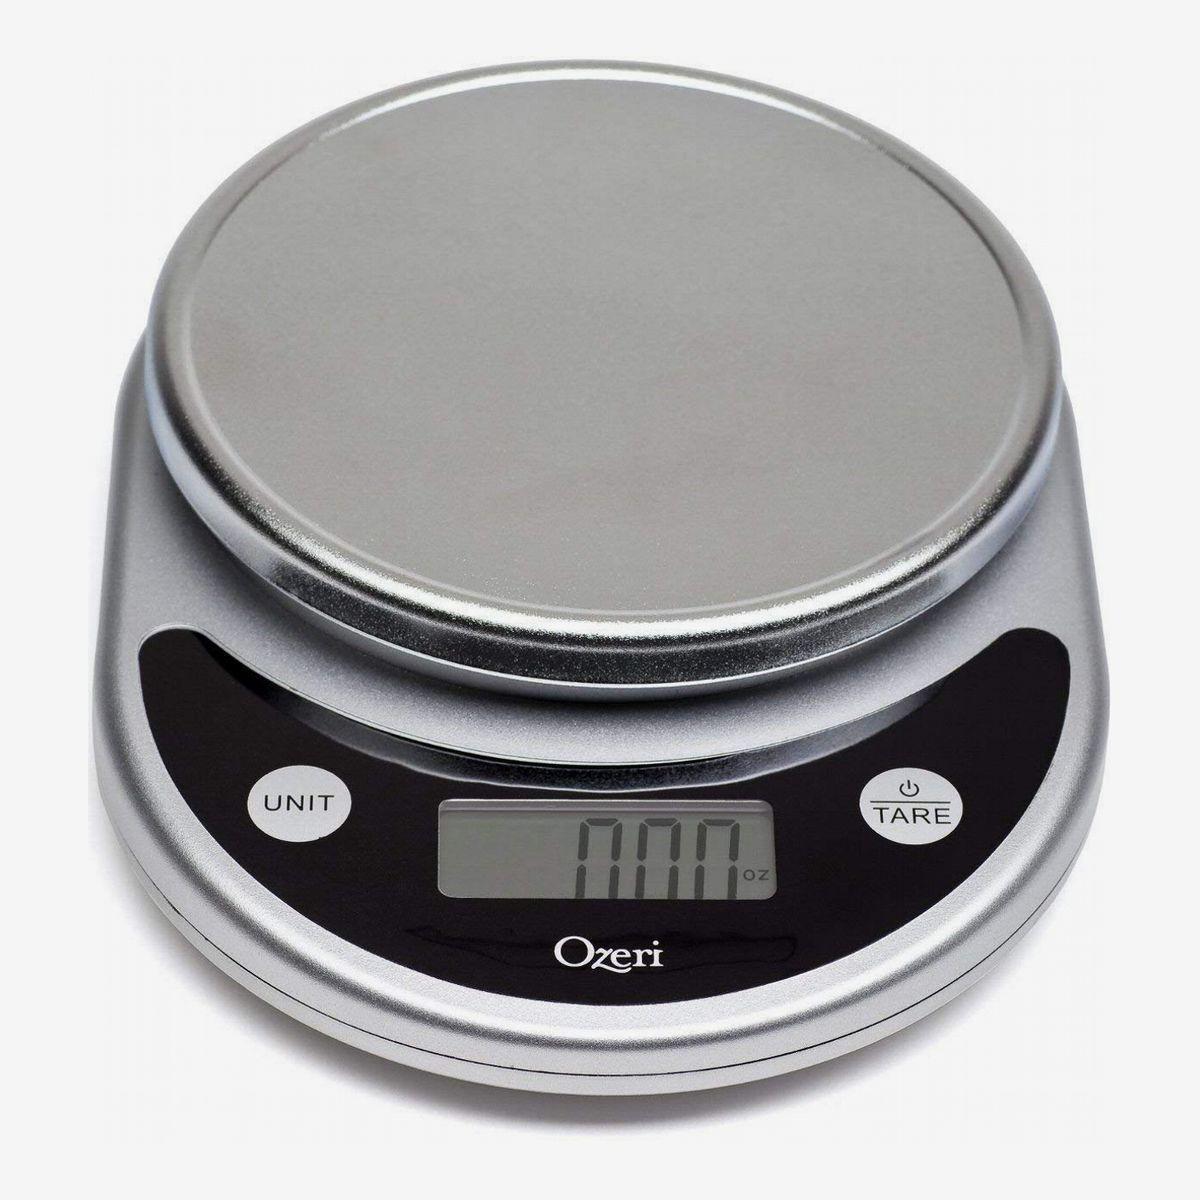 A kitchen scale